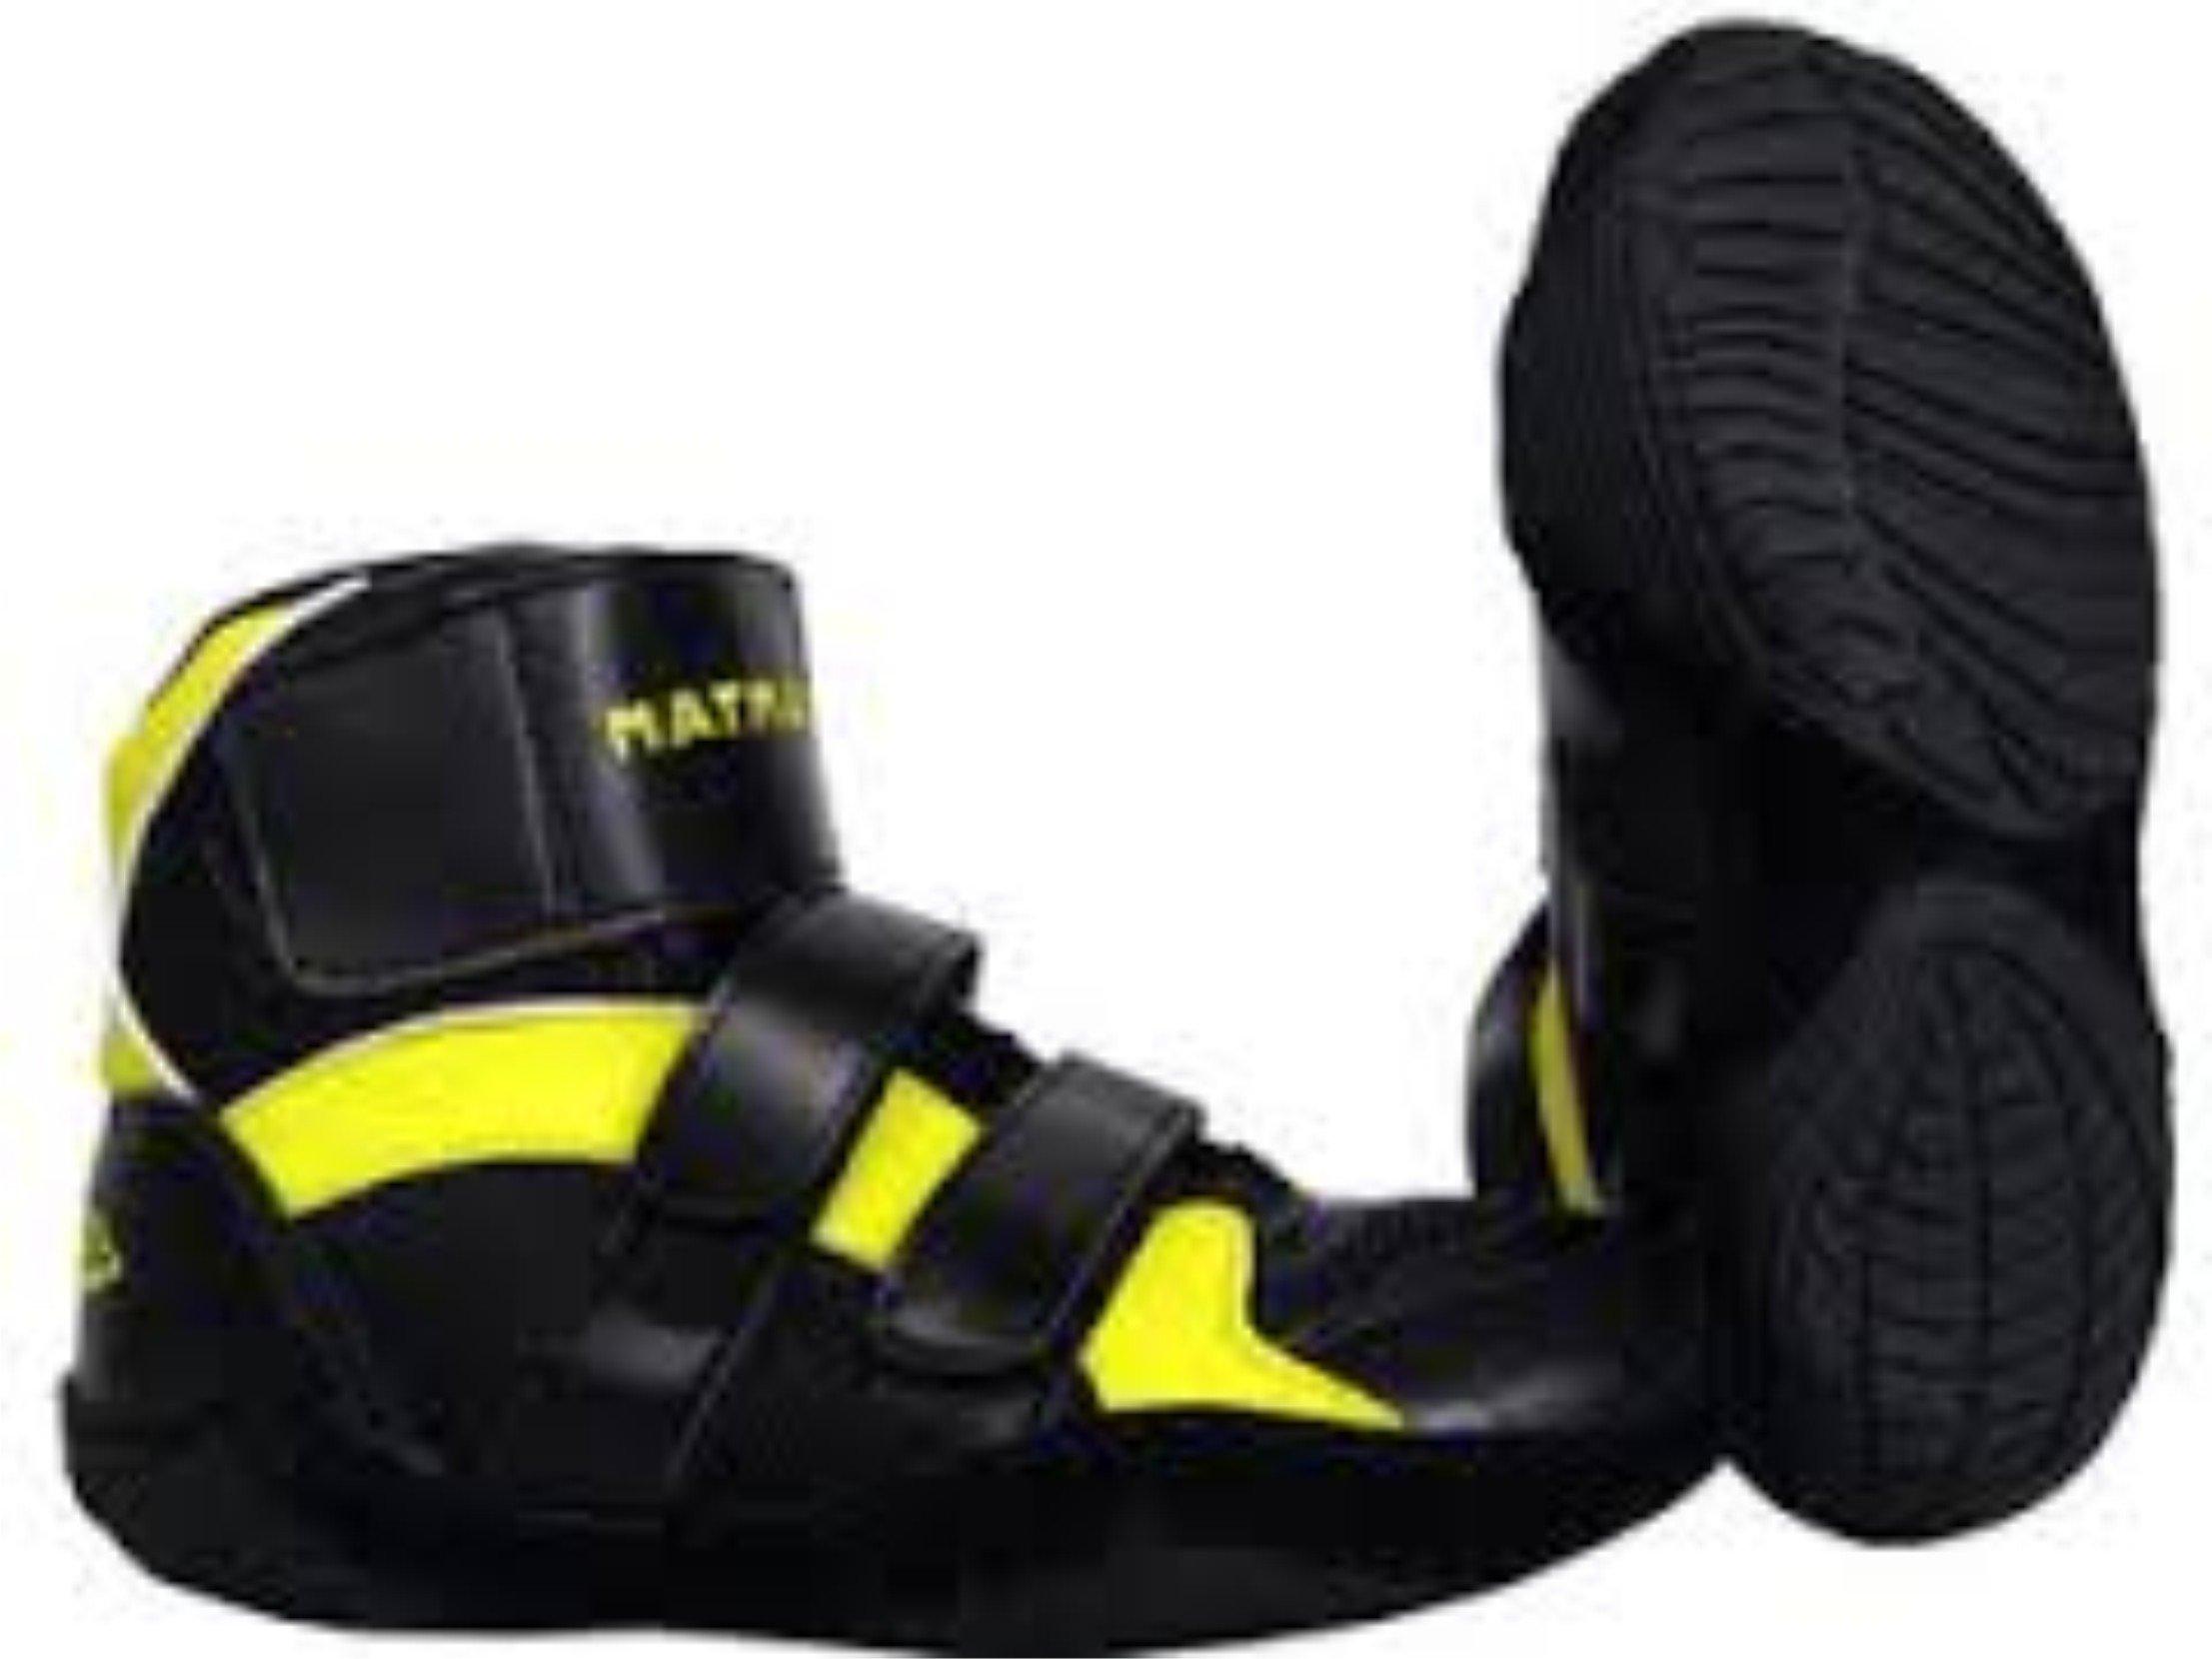 Matman Scrapper Youth Wrestling Shoes - Black/Gold Gold - 5 by Matman